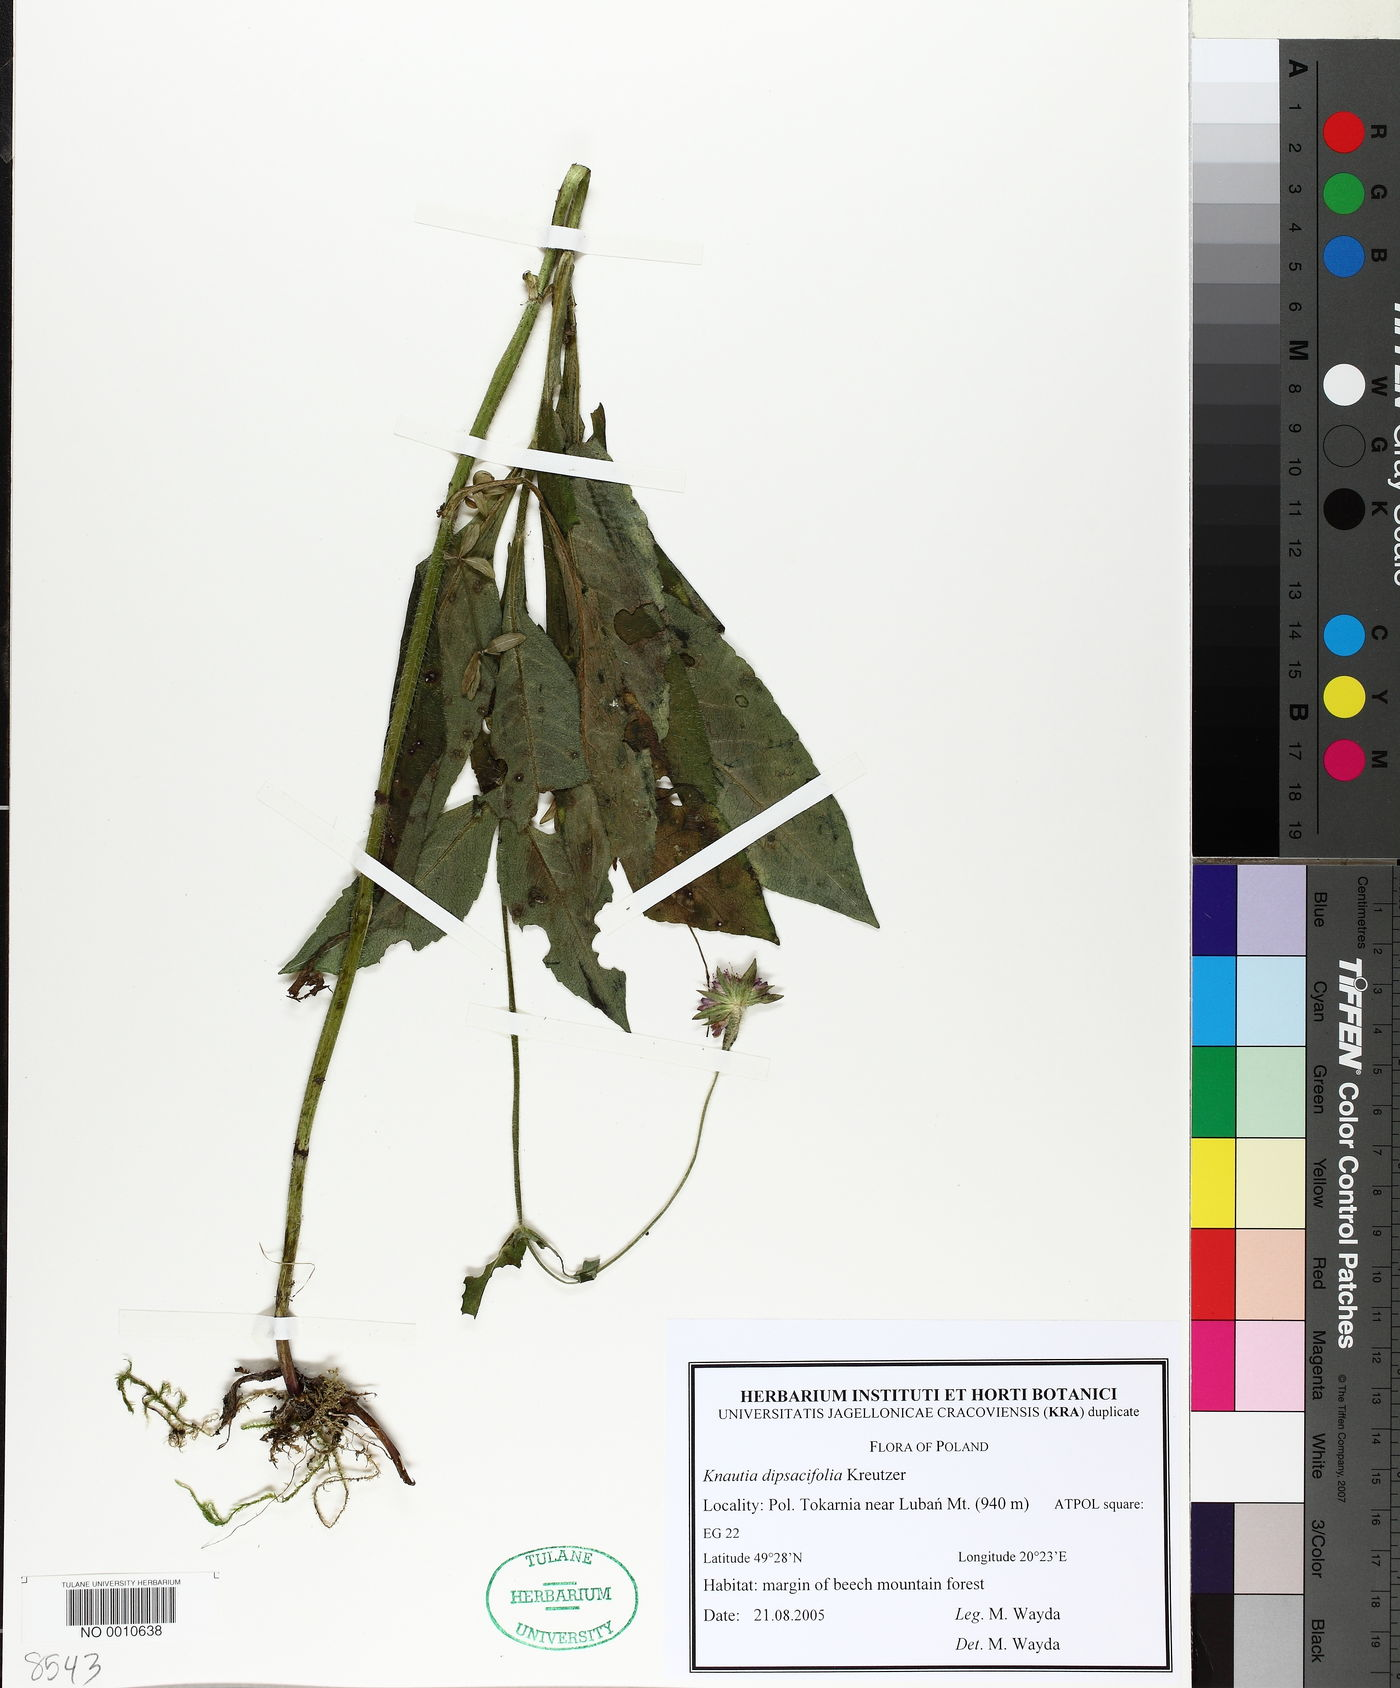 Knautia dipsacifolia image